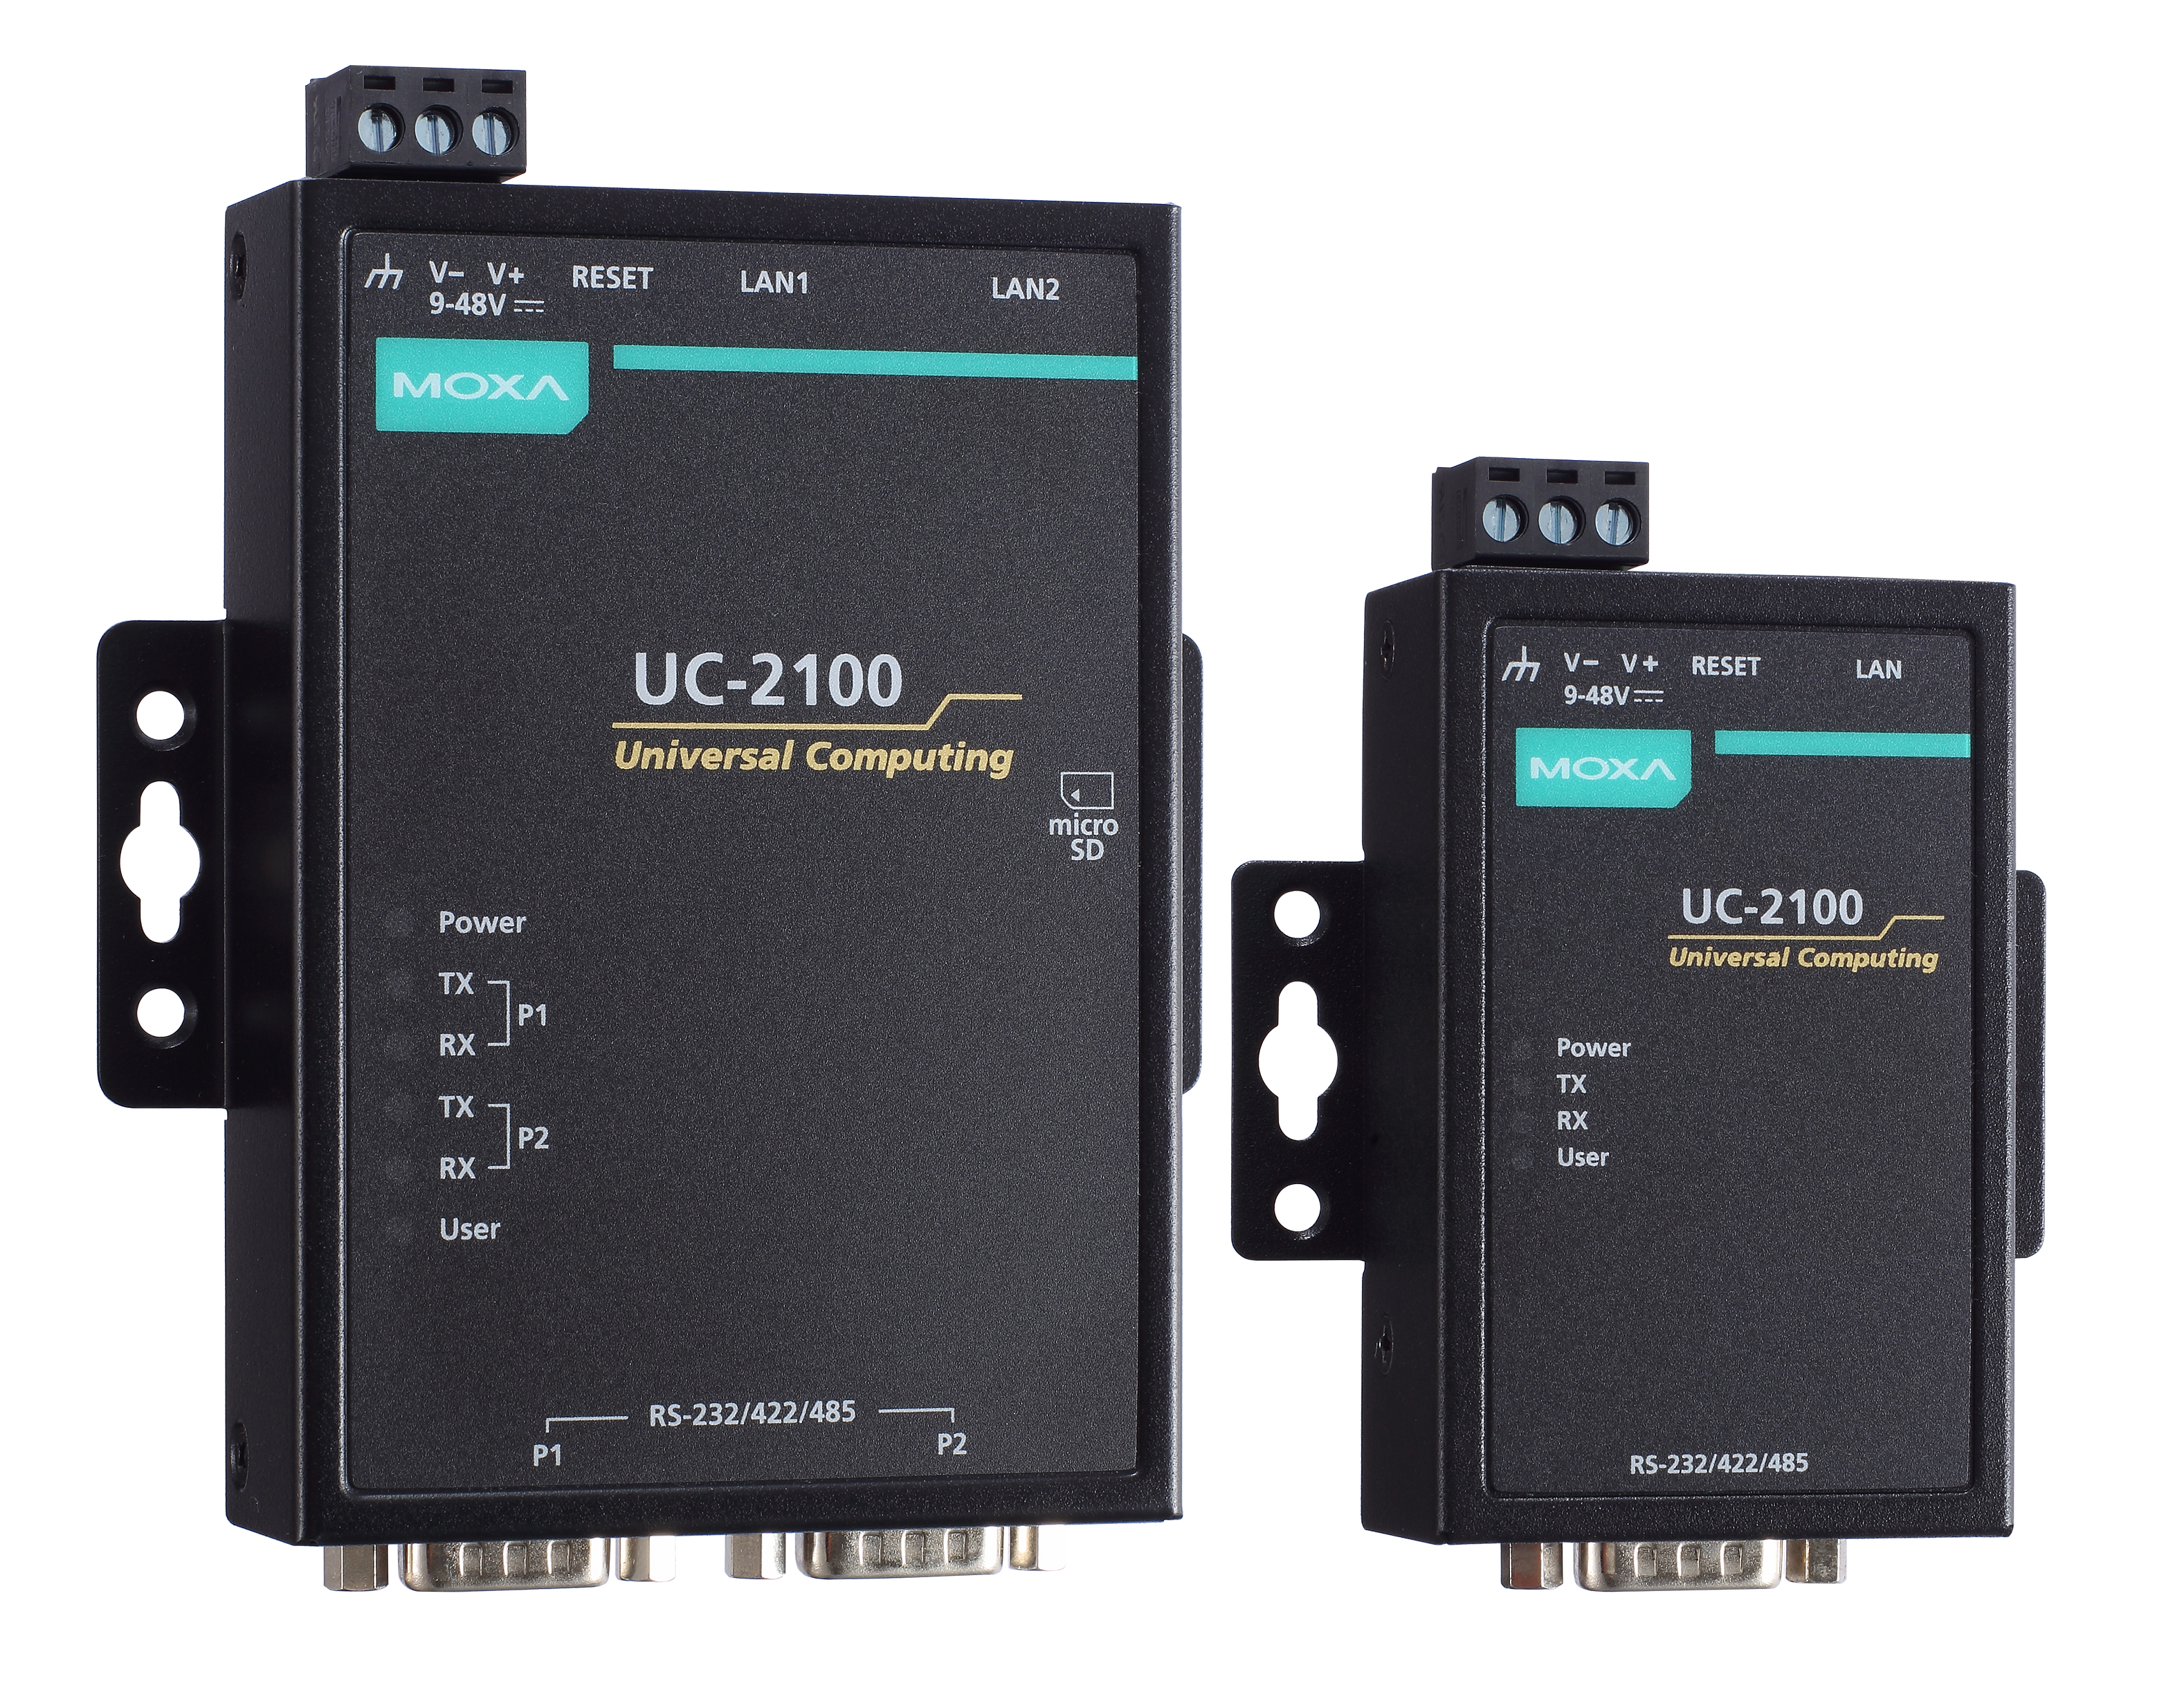 MOXA UC-2100 Series